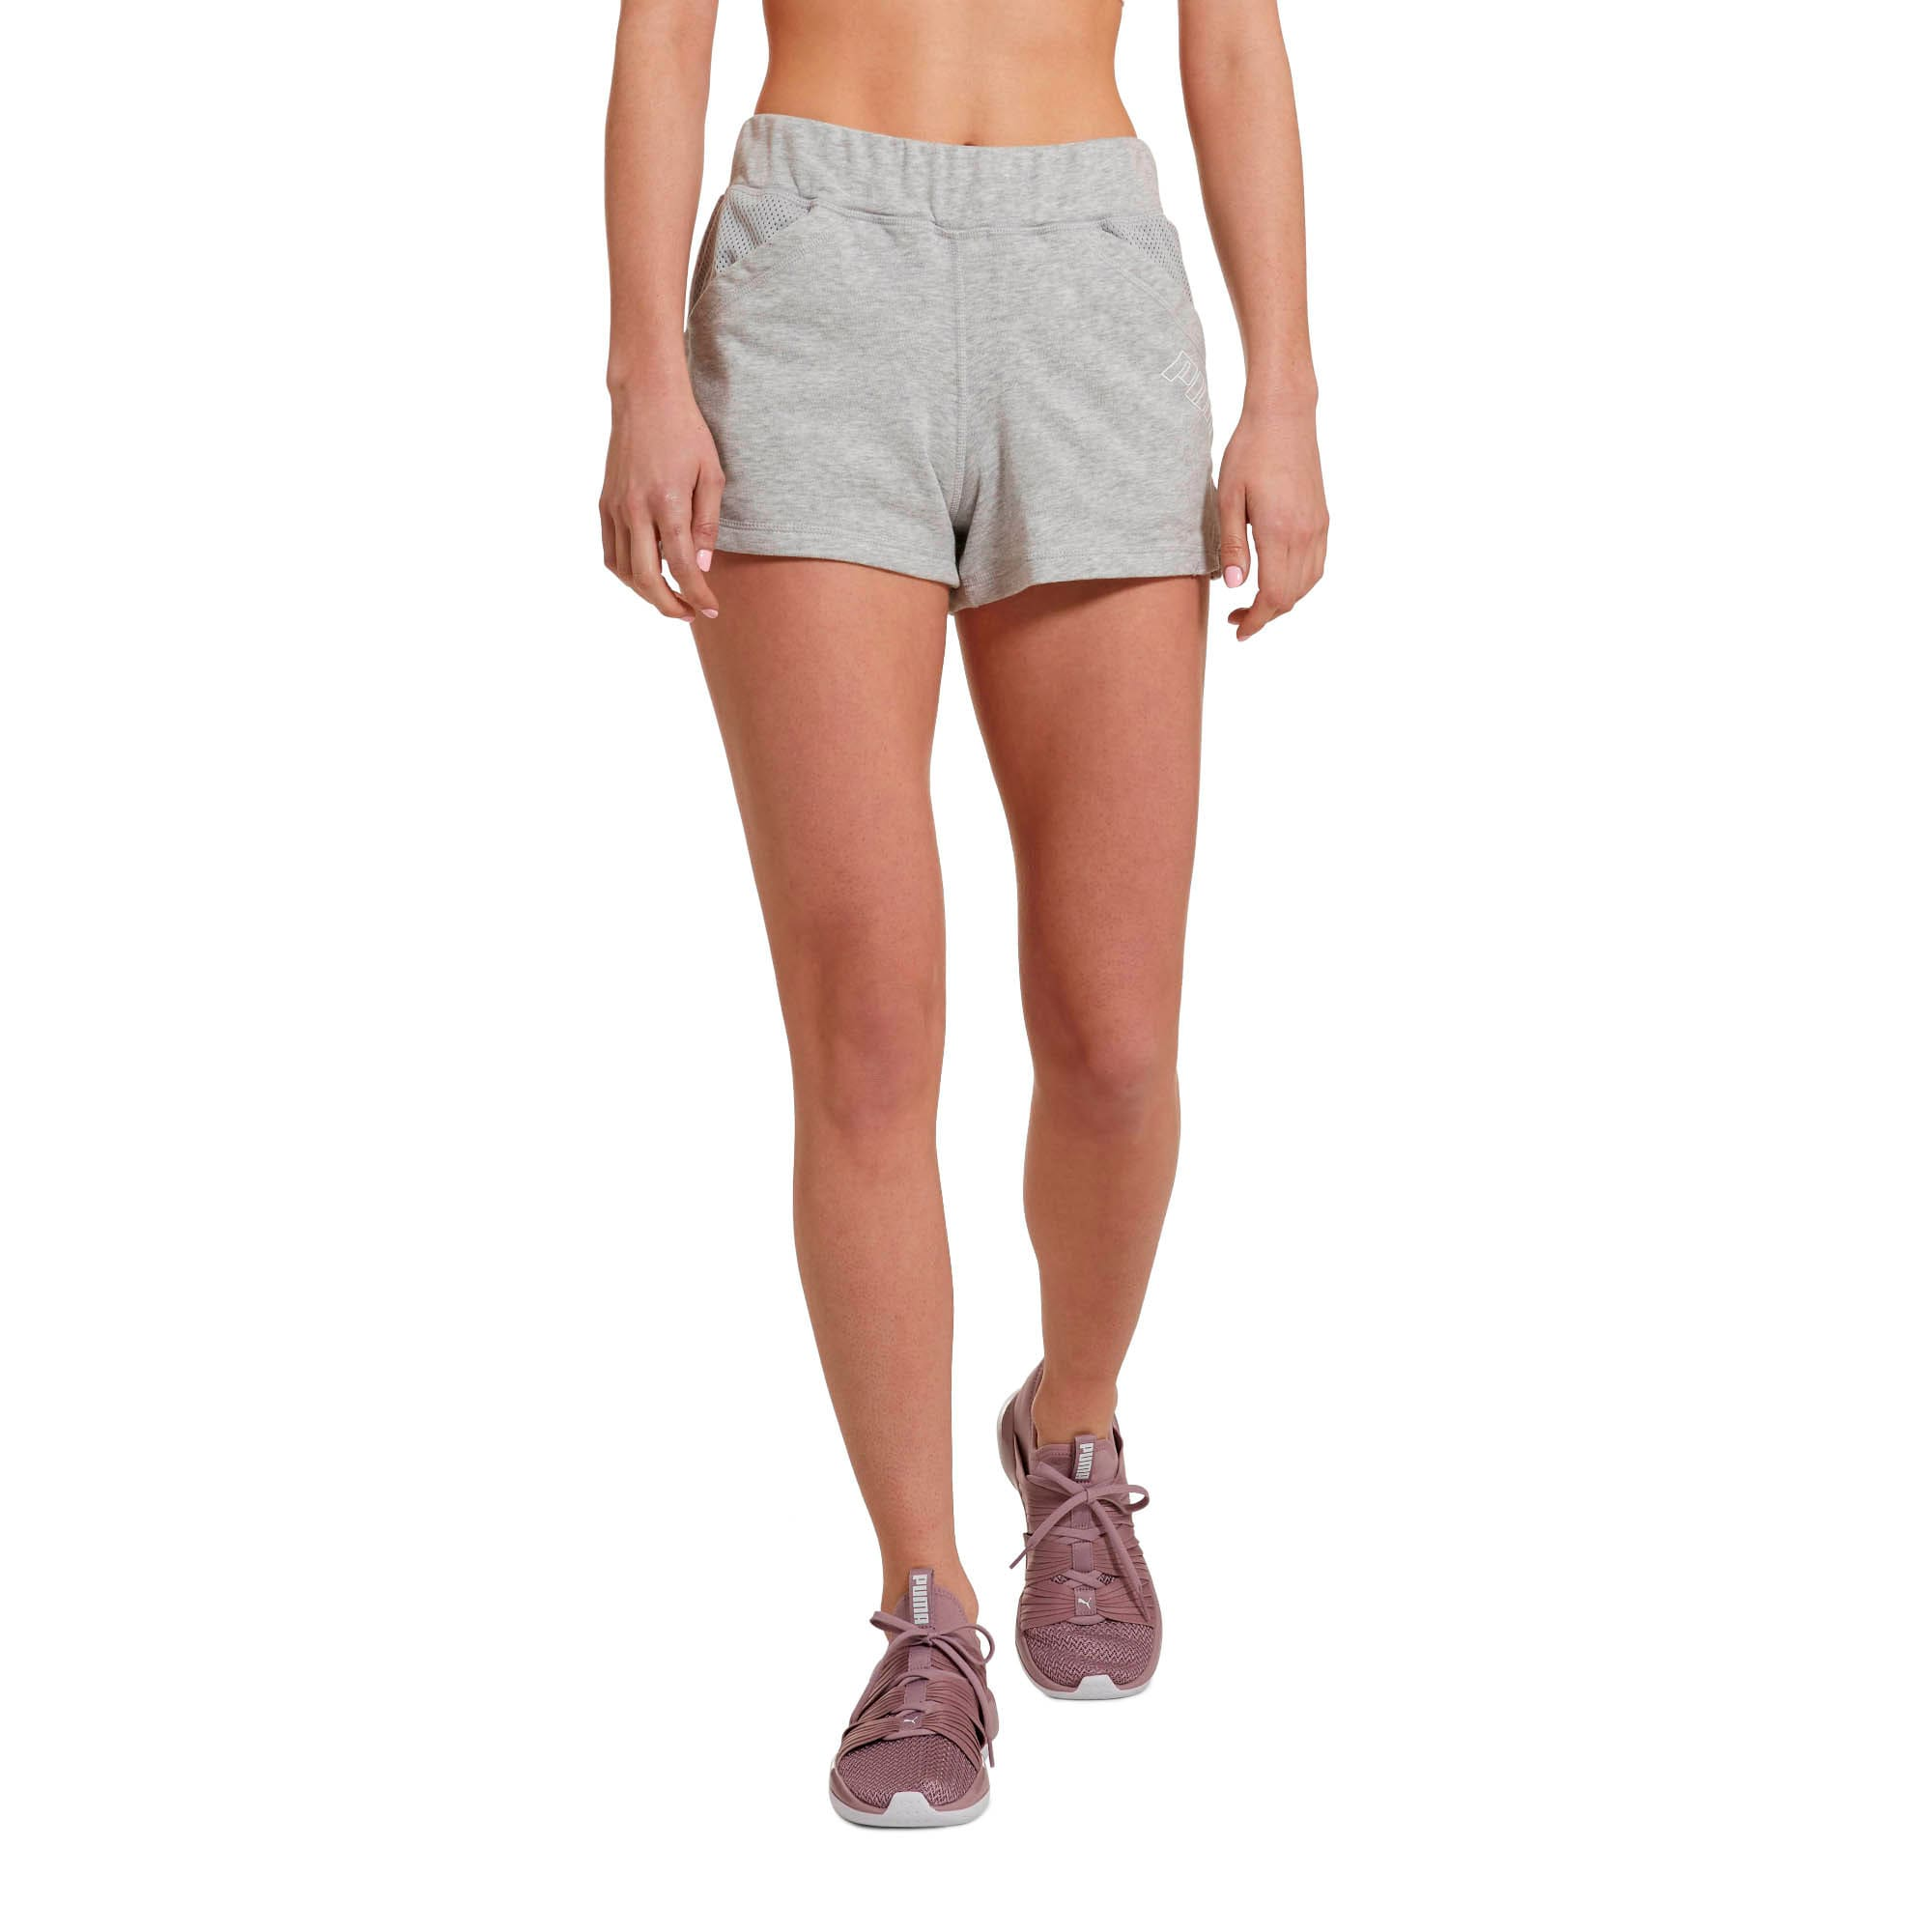 "Thumbnail 1 of Yogini Women's 3"" Shorts, Light Gray Heather, medium"